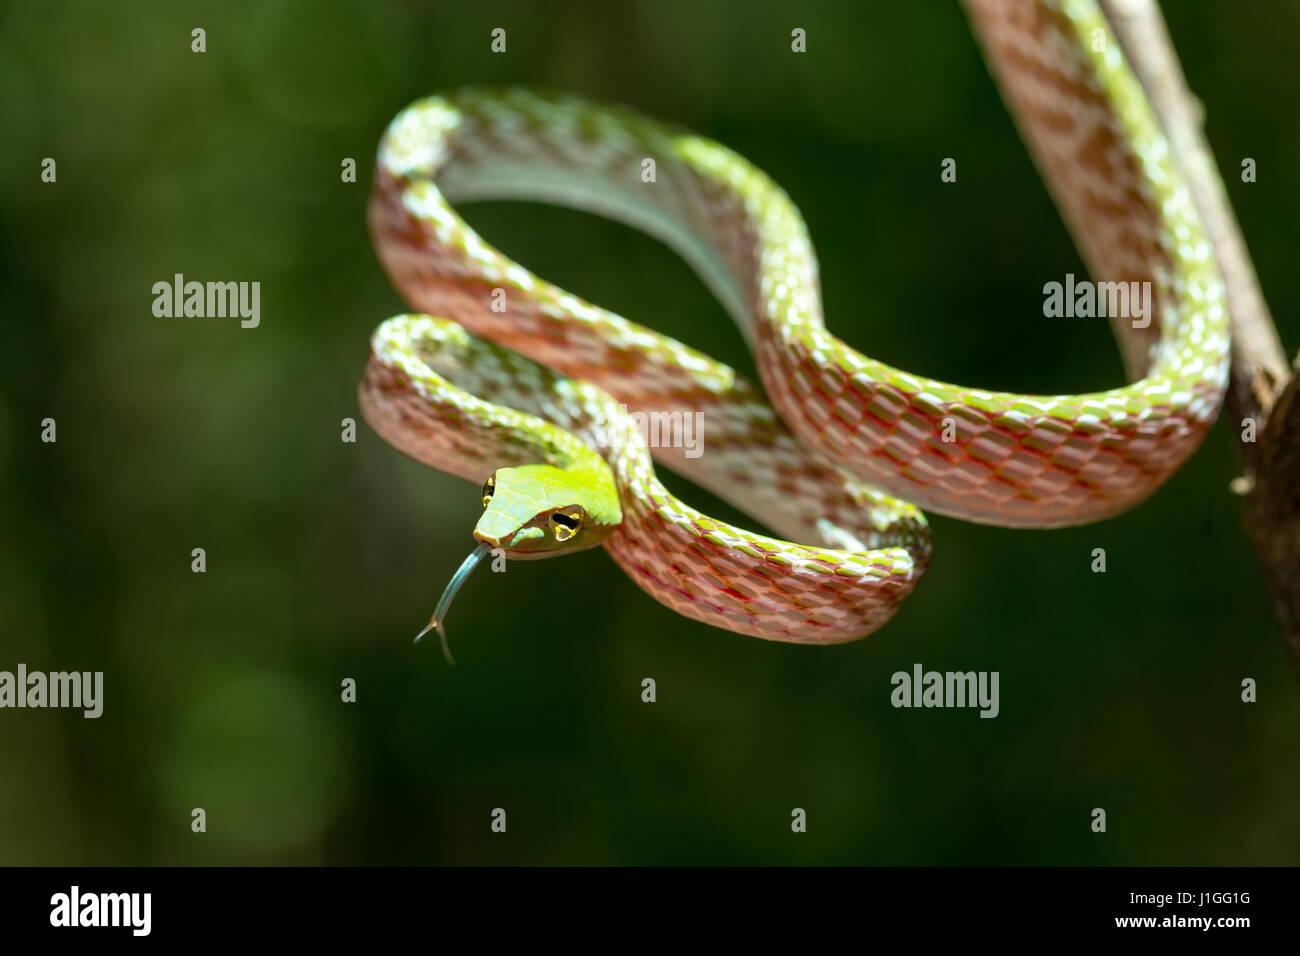 Whipsnake Oriental, asiatique Vine green Snake (Ahaetulla prasina) Tangkoko dans la réserve naturelle de la faune du nord de Sulawesi, Indonésie Banque D'Images